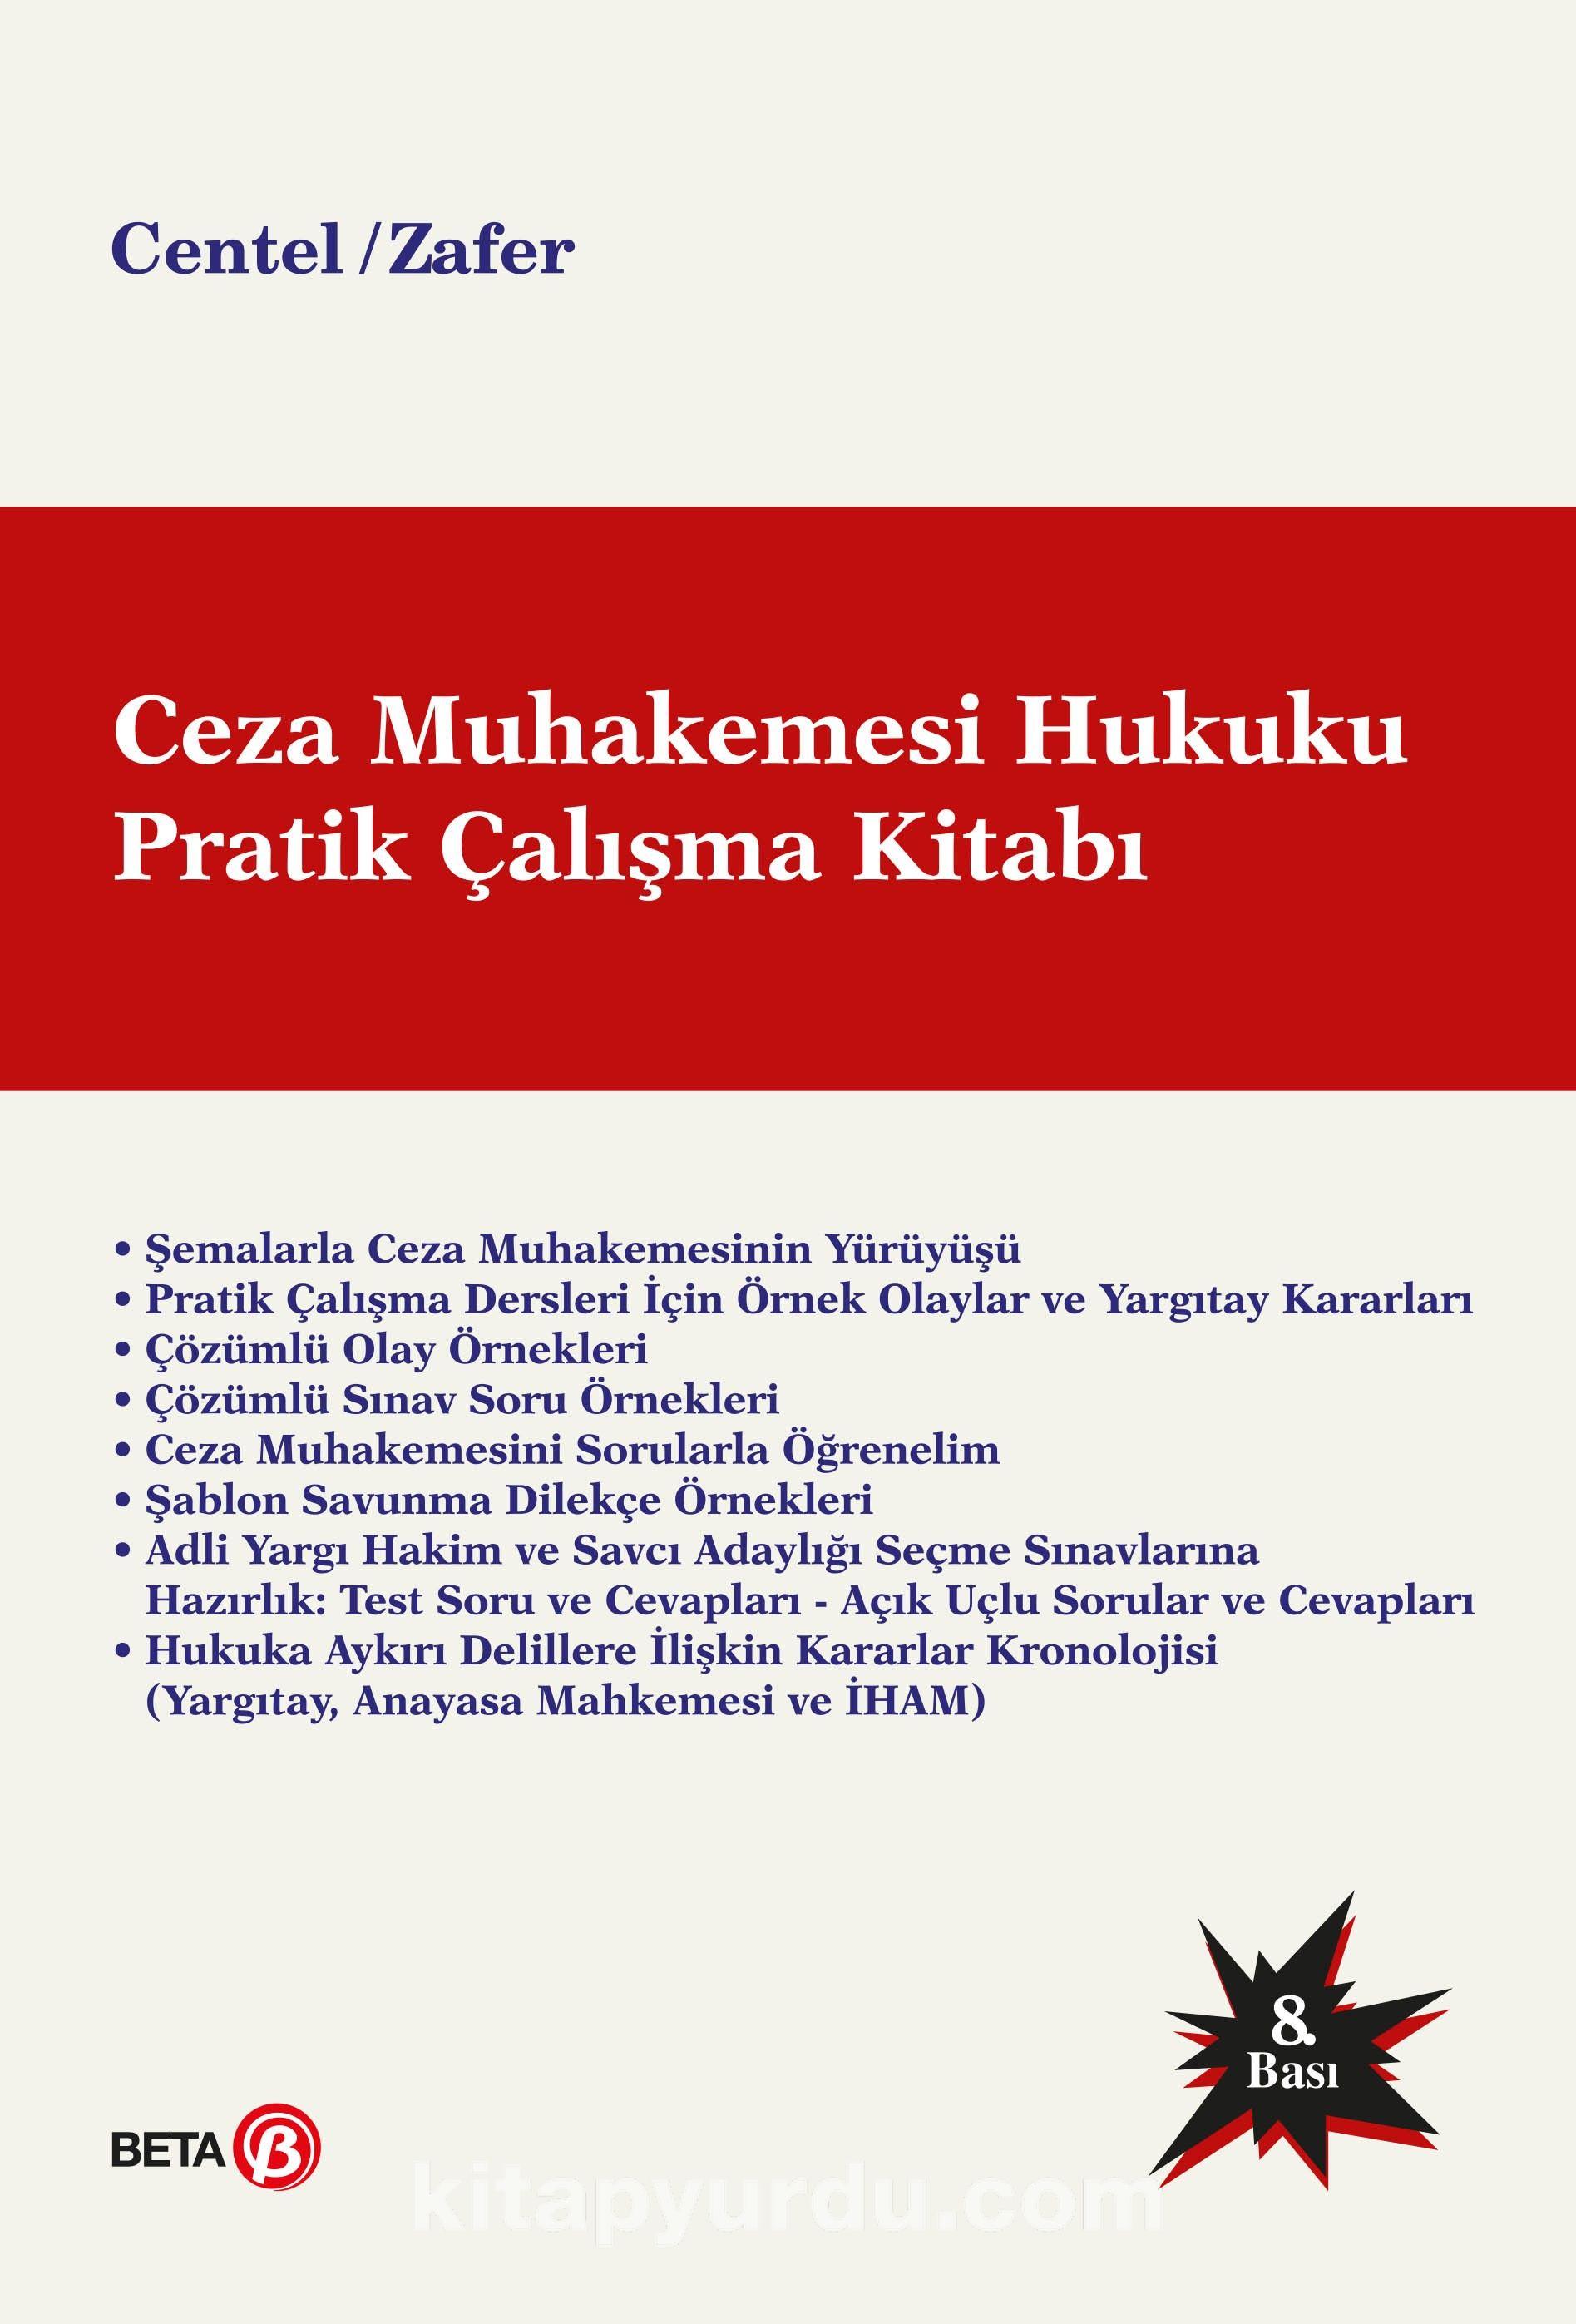 Ceza Muhakemesi Hukuku Pratik Çalışma Kitabı - Prof. Dr. Hamide Zafer pdf epub